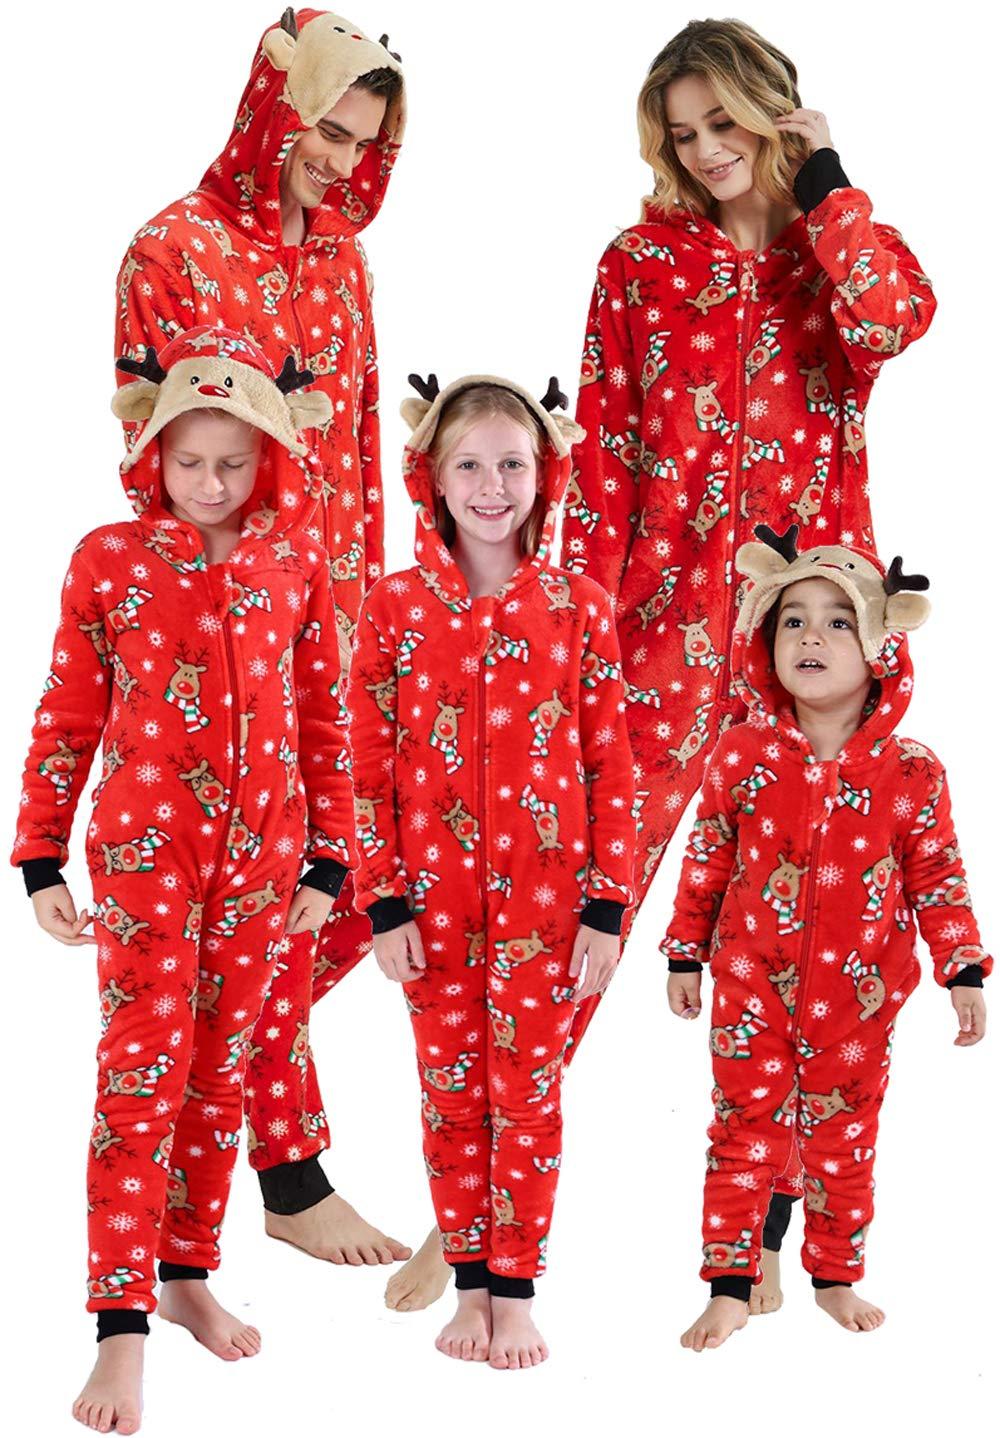 Family Christmas Pajamas Matching Sets Printed Long Sleeve One-Piece Hooded Sleepwear Jumpsuit Loungewear Red